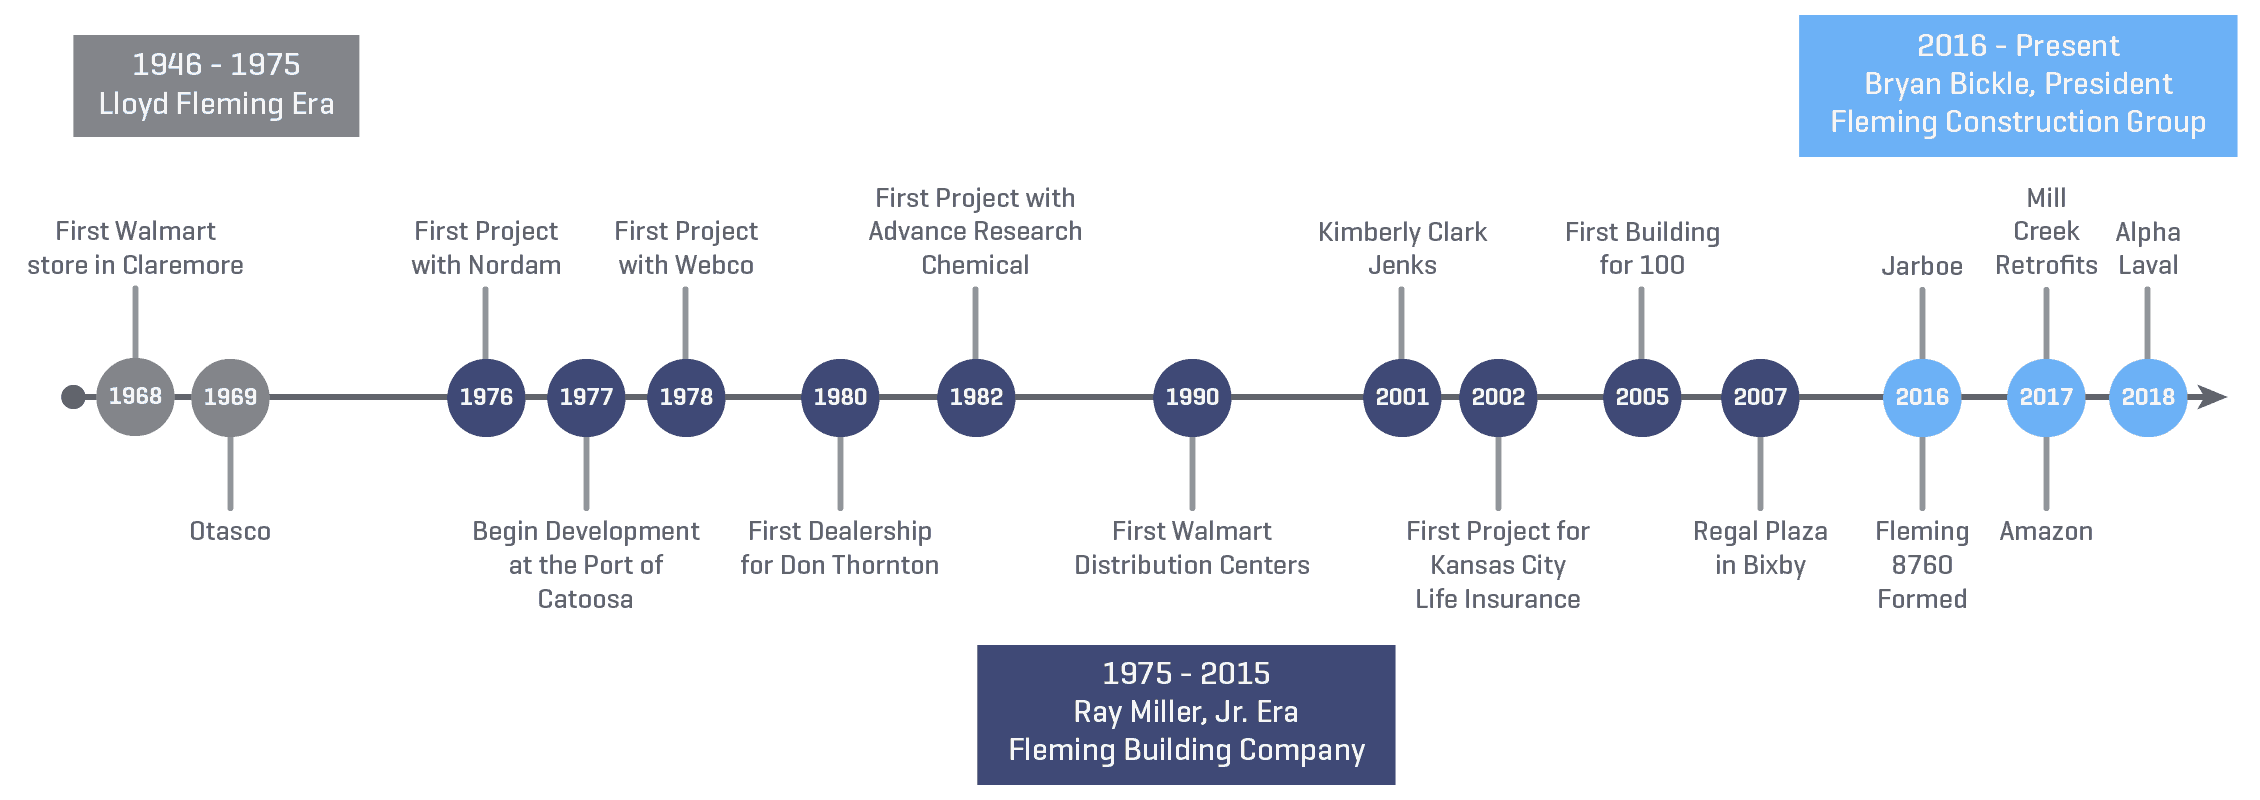 FSE_Company_History_Timeline_2x